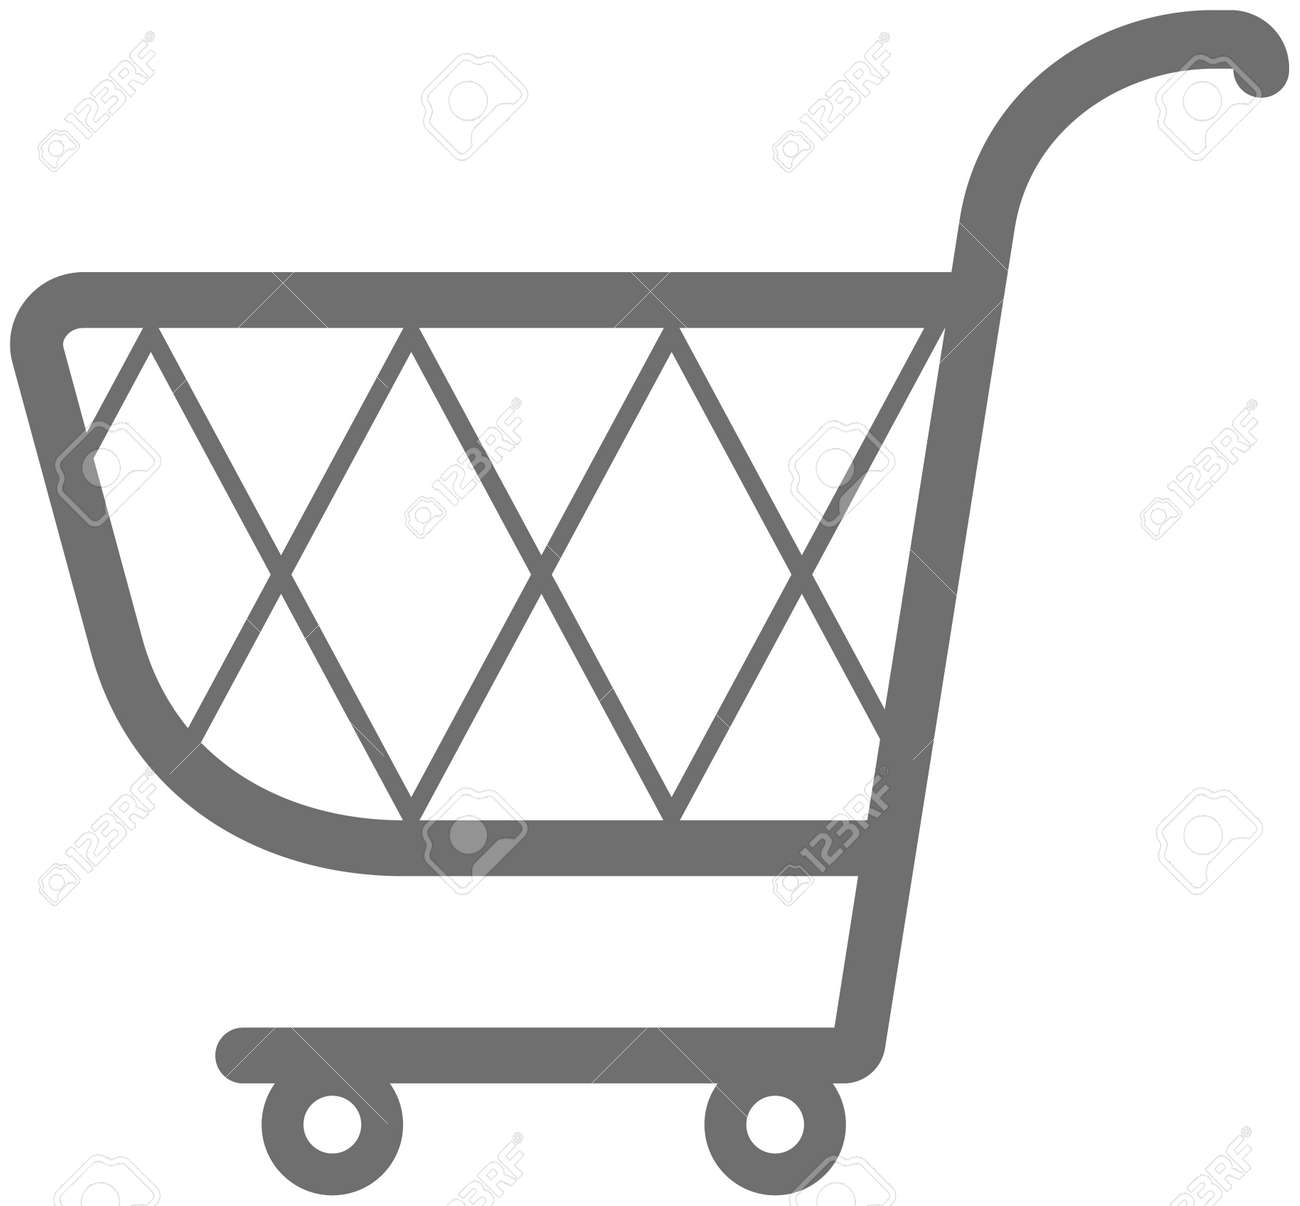 Shopping cart illustration Stock Vector - 4960631